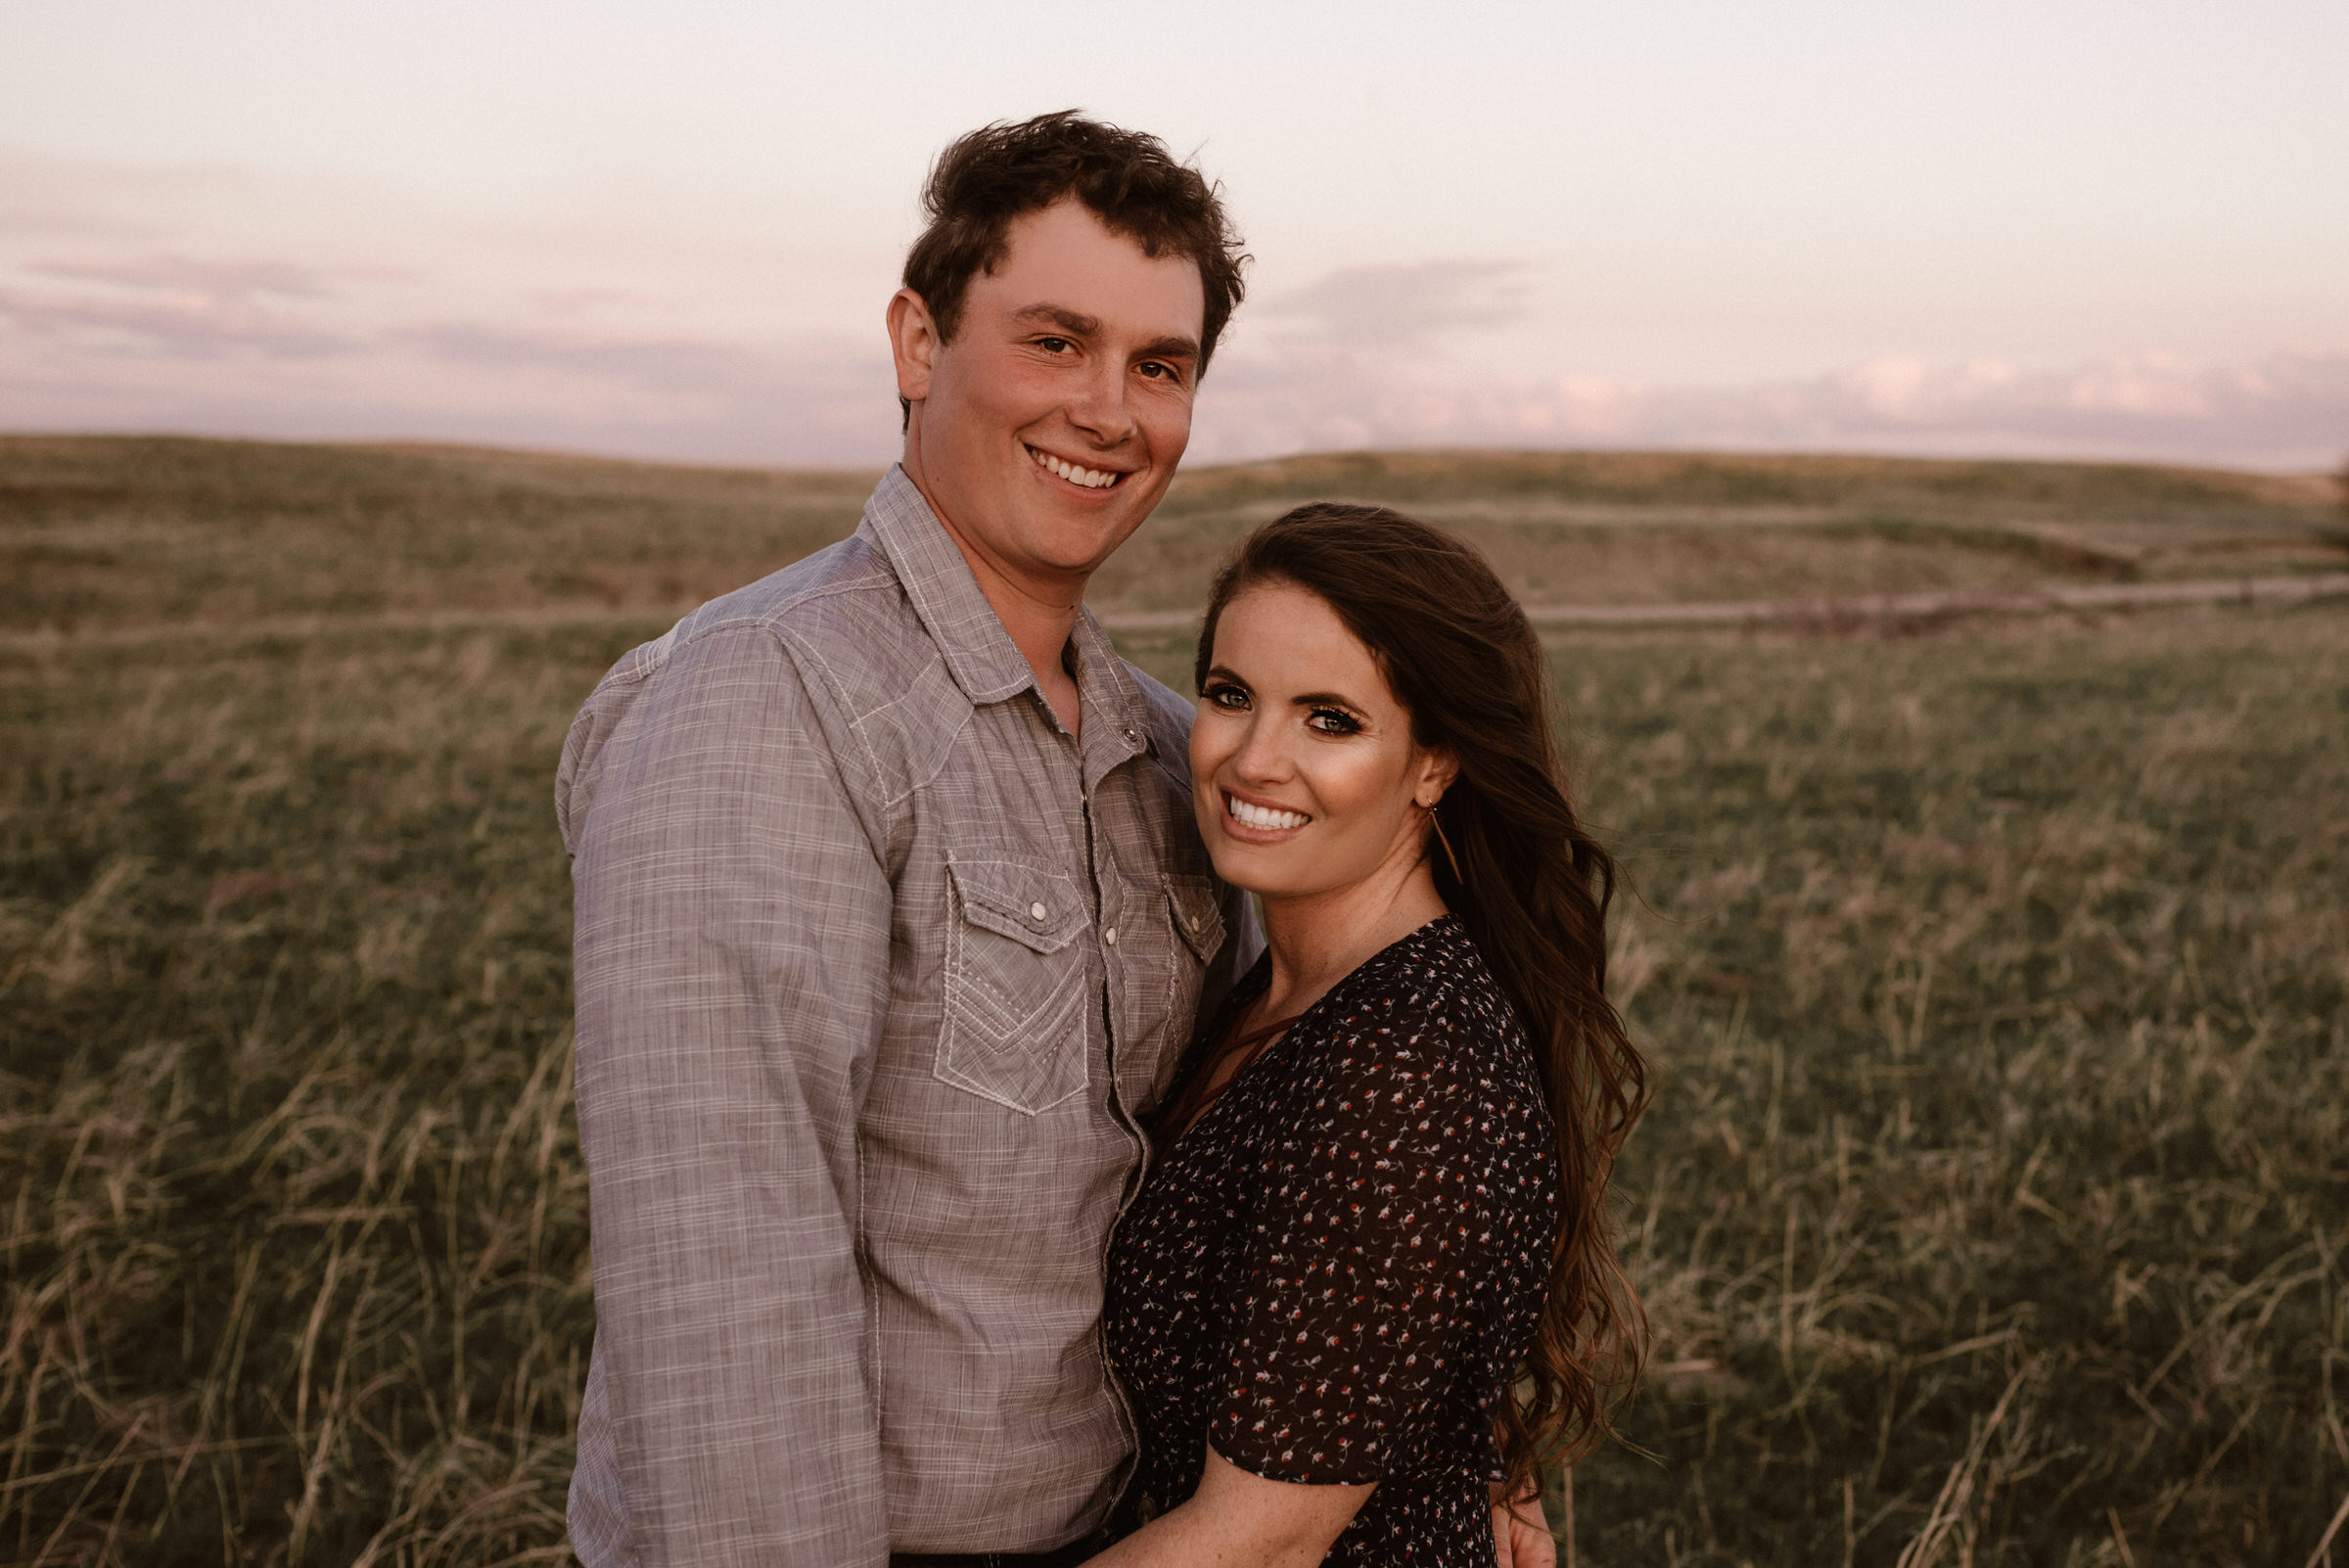 Sandhills-Nebraska-Engagement-Wedding-Photographer-Kaylie-Sirek-Photography-045.jpg